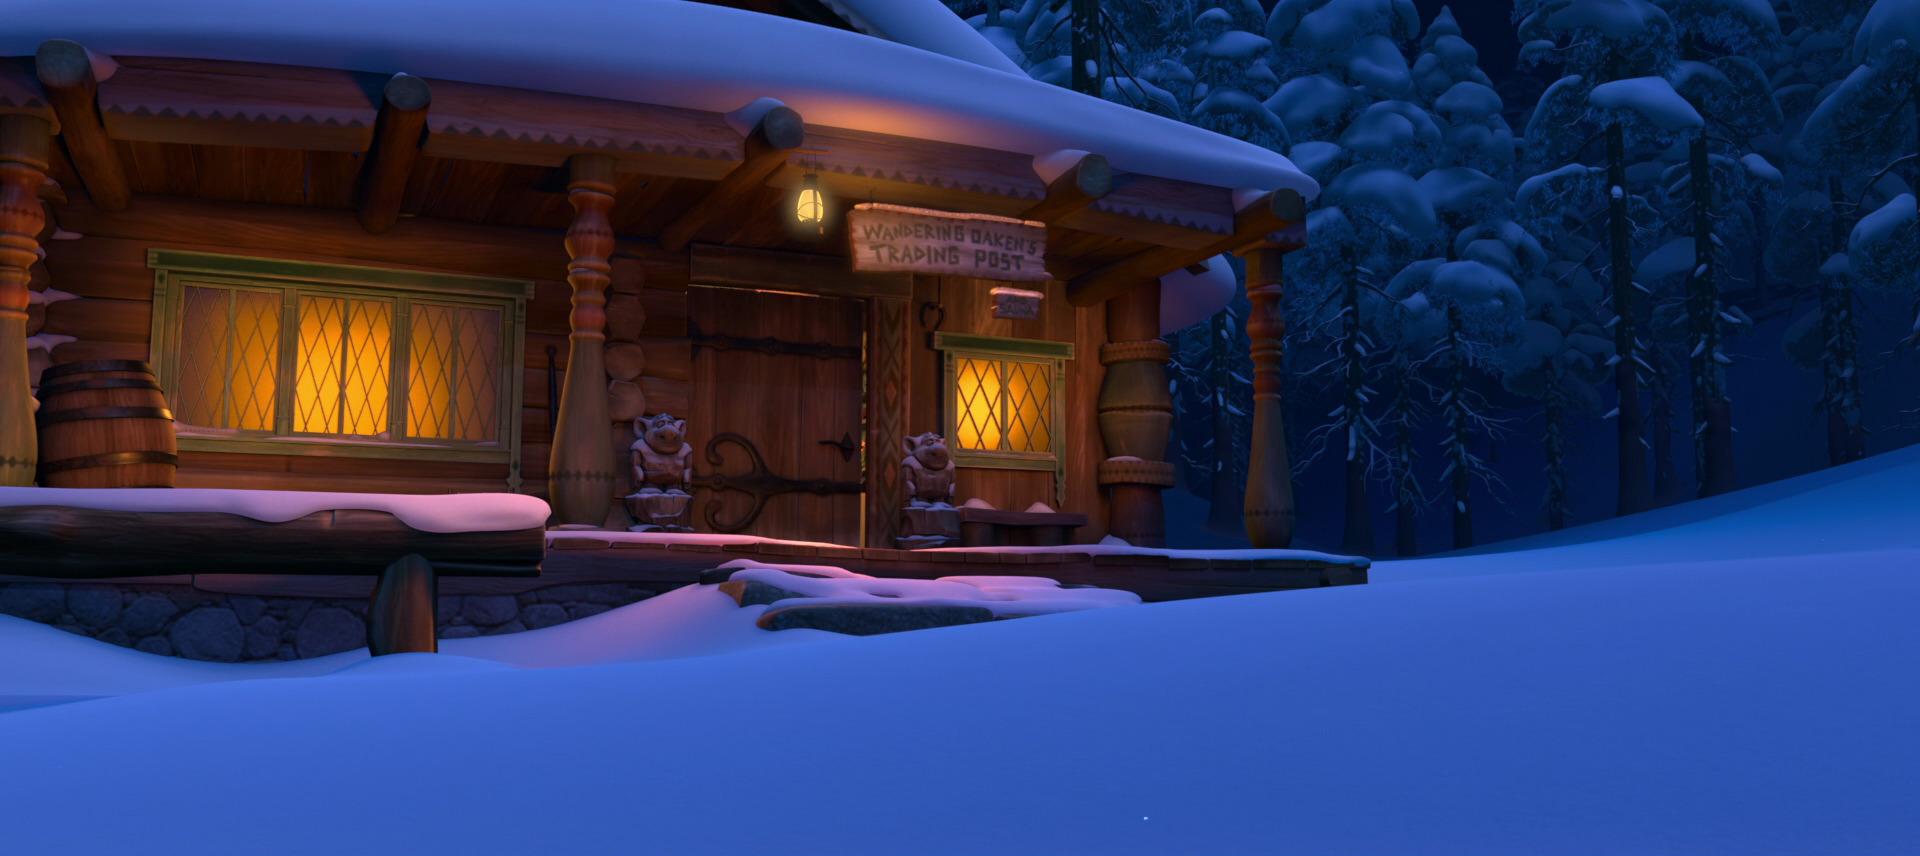 Wandering Oaken S Trading Post And Sauna Disney Wiki Fandom